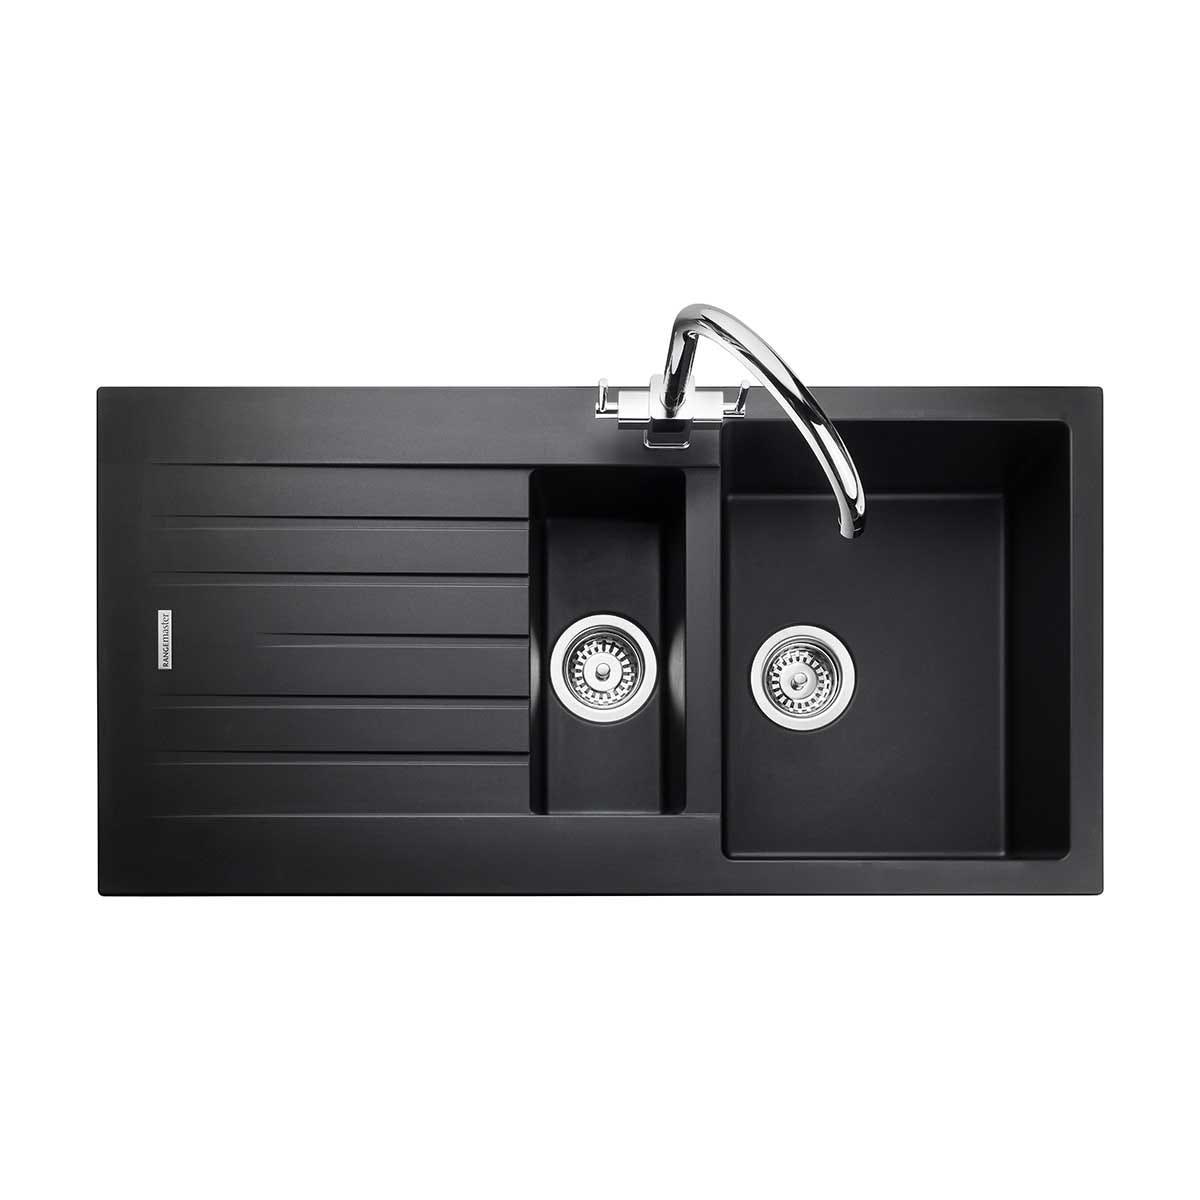 Aga Rangemaster Andesite 1-Tap 1.5 Bowl Igneous Granite Kitchen Sink - Ash Black